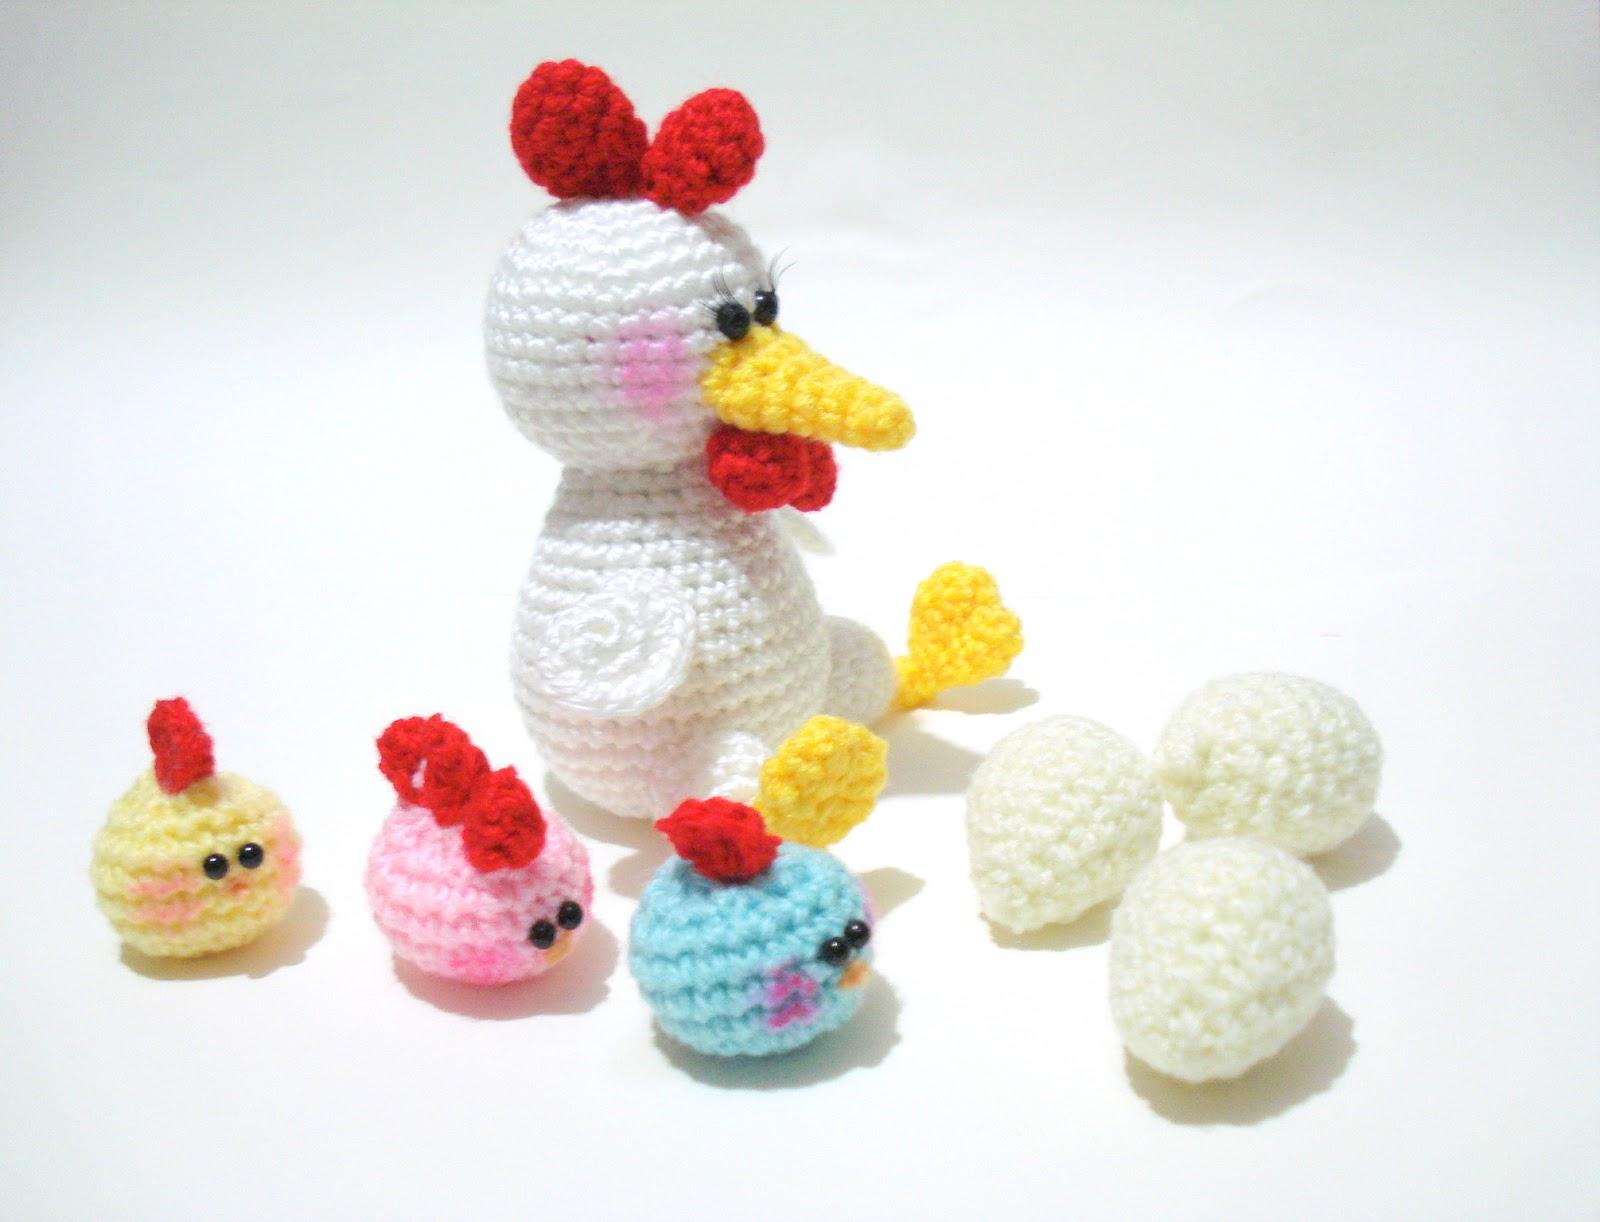 Amigurumi Baby Chick Pattern : AllSoCute Amigurumis: Amigurumi Hen and Chicks Pattern ...